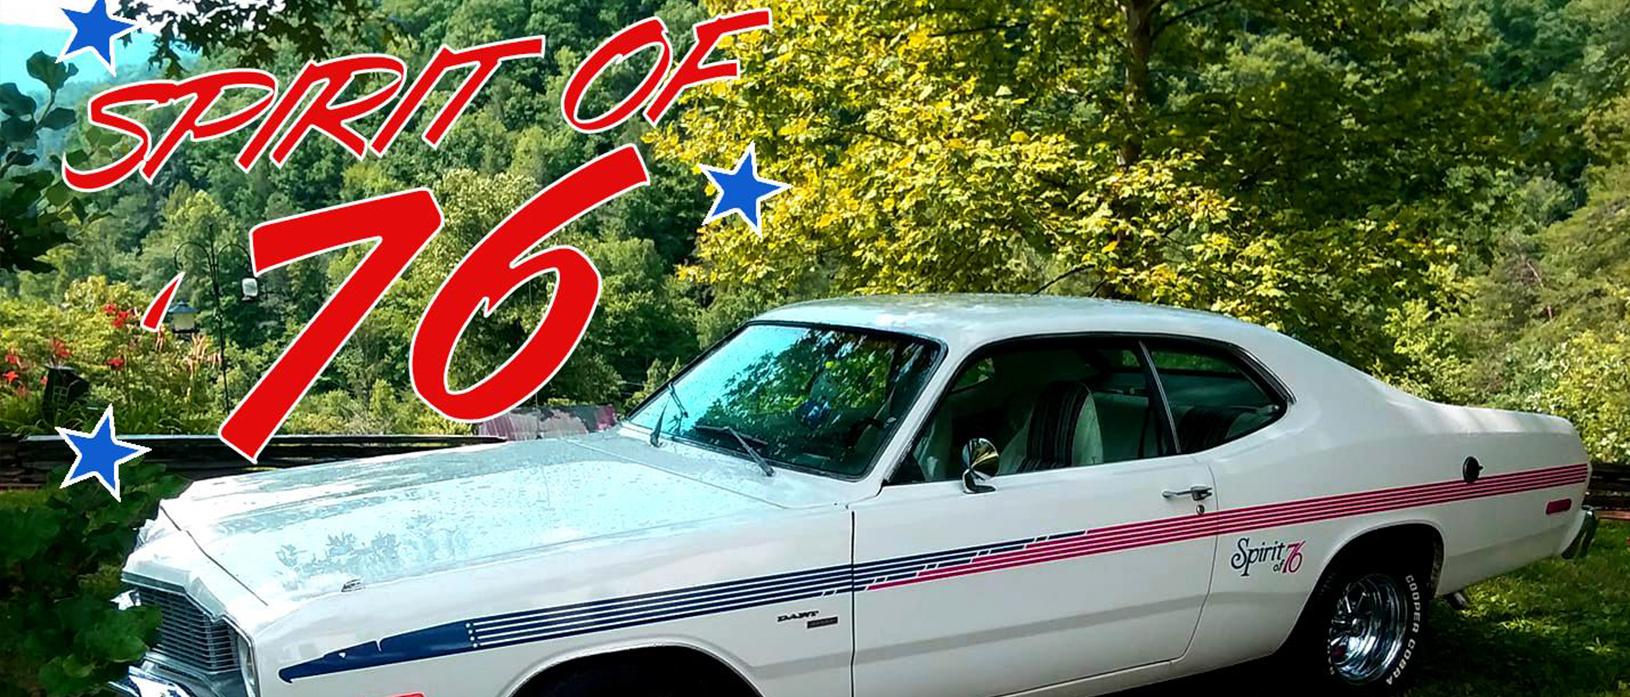 a spirit '76 edition Dodge Dart